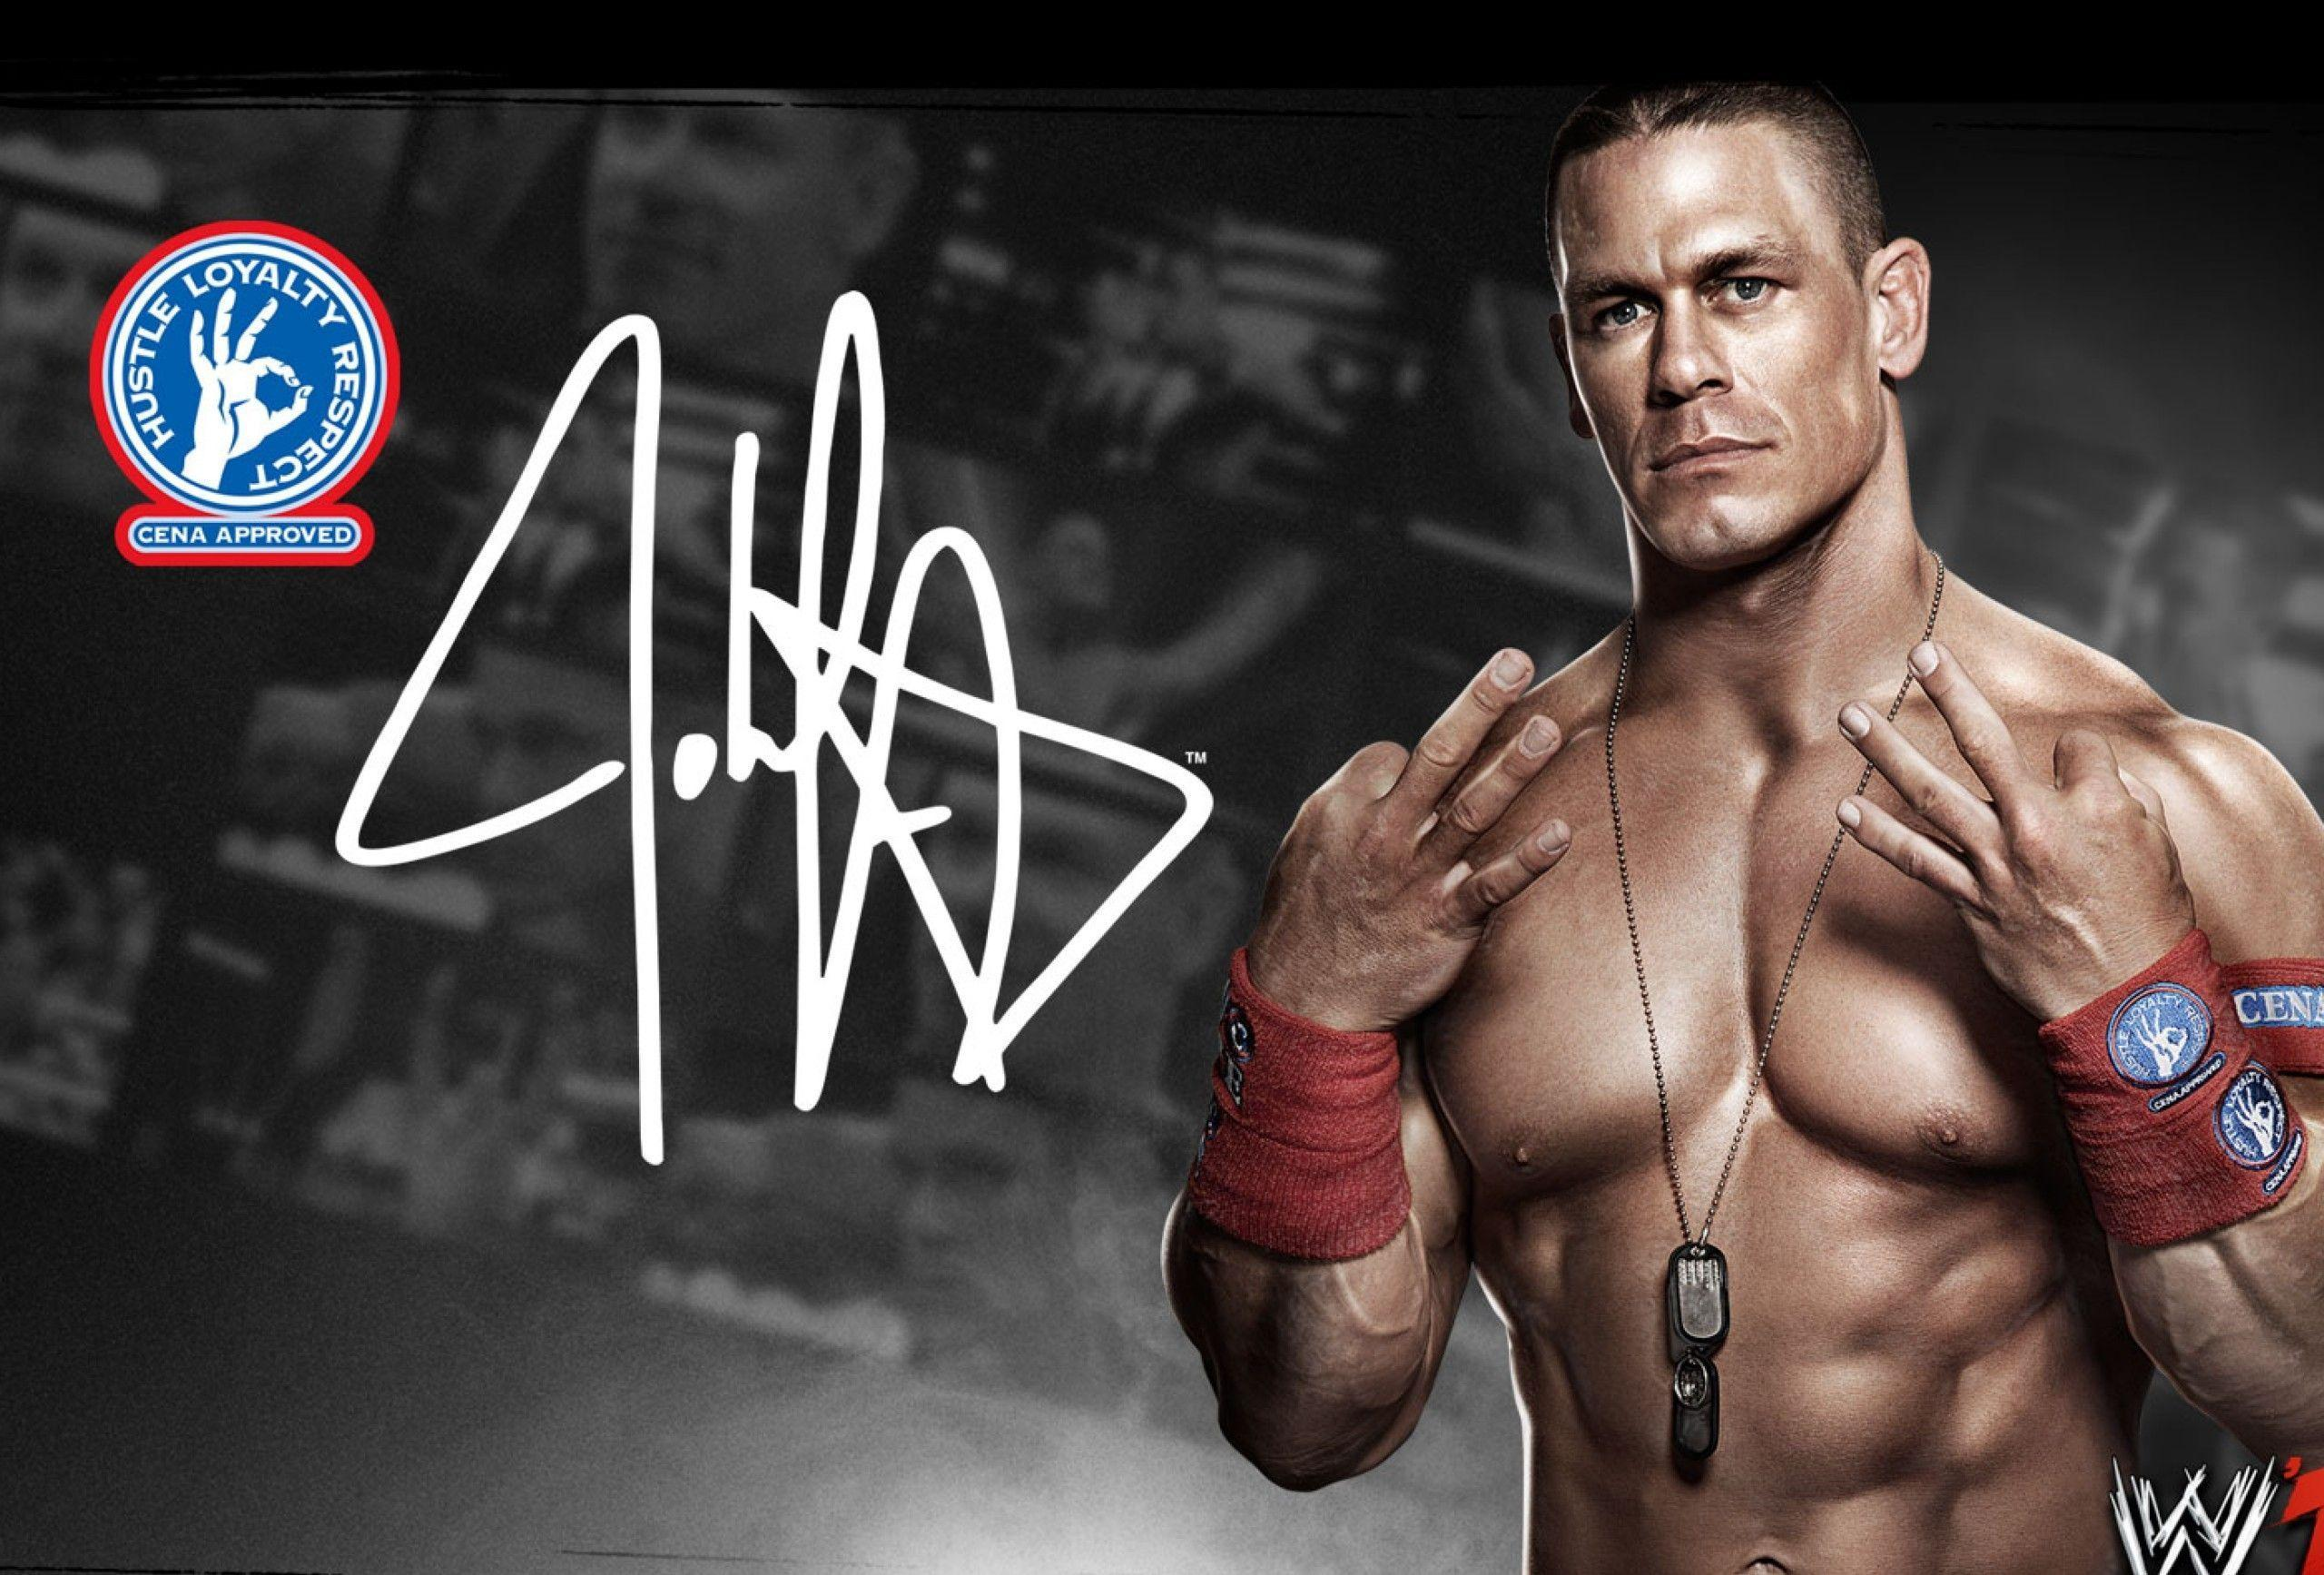 Wwe John Cena New Hd Wallpapers Wallpaper Cave